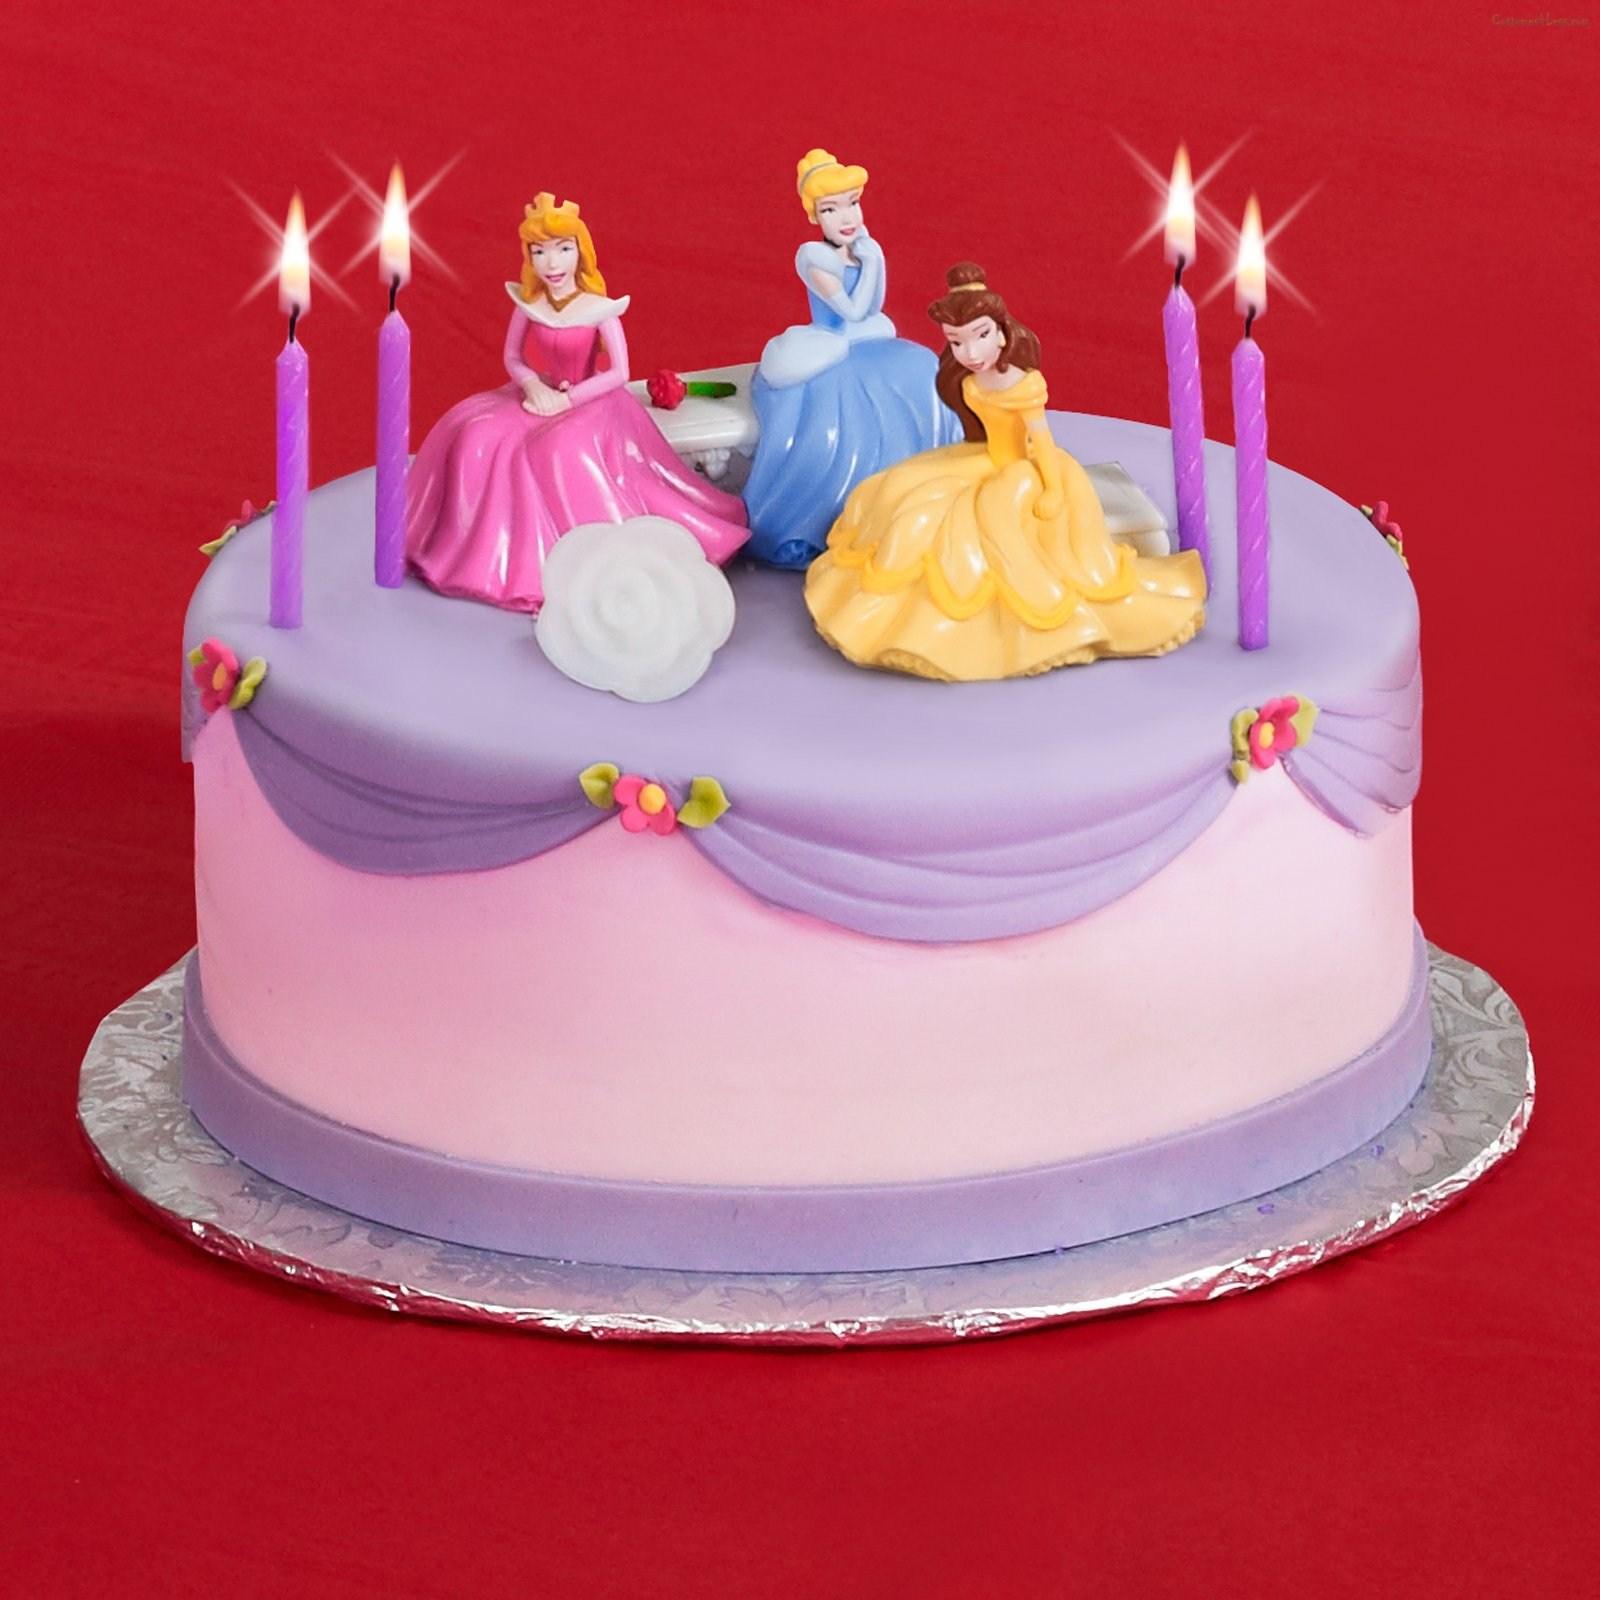 Birthday Cake For Princes  Image Inspiration Of Cake And Birthday - Cakes for princess birthday